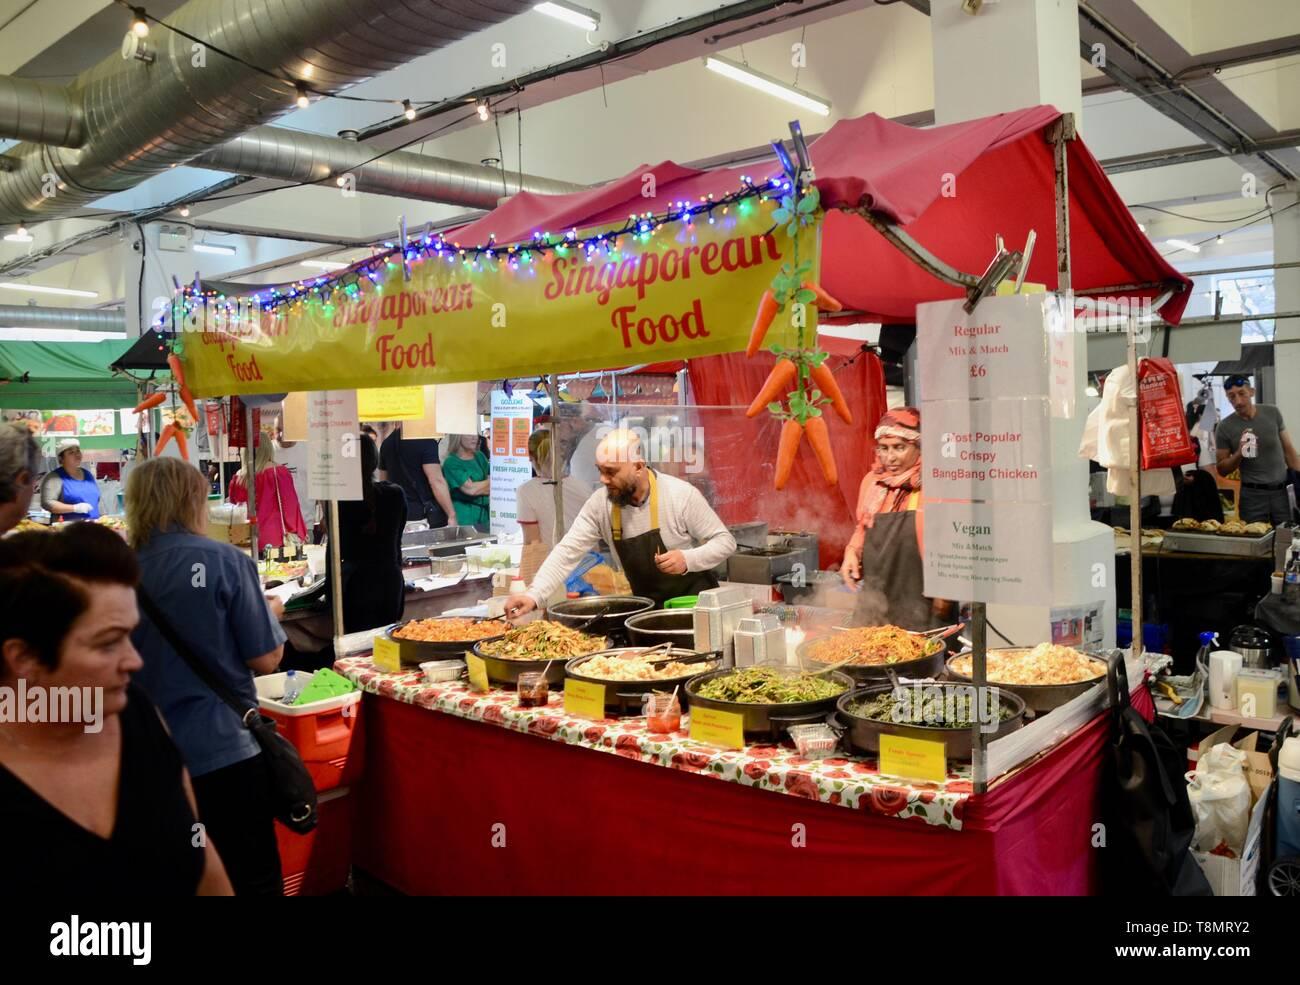 singaporean food stall at sunday upmarket brick lane london east UK Stock Photo